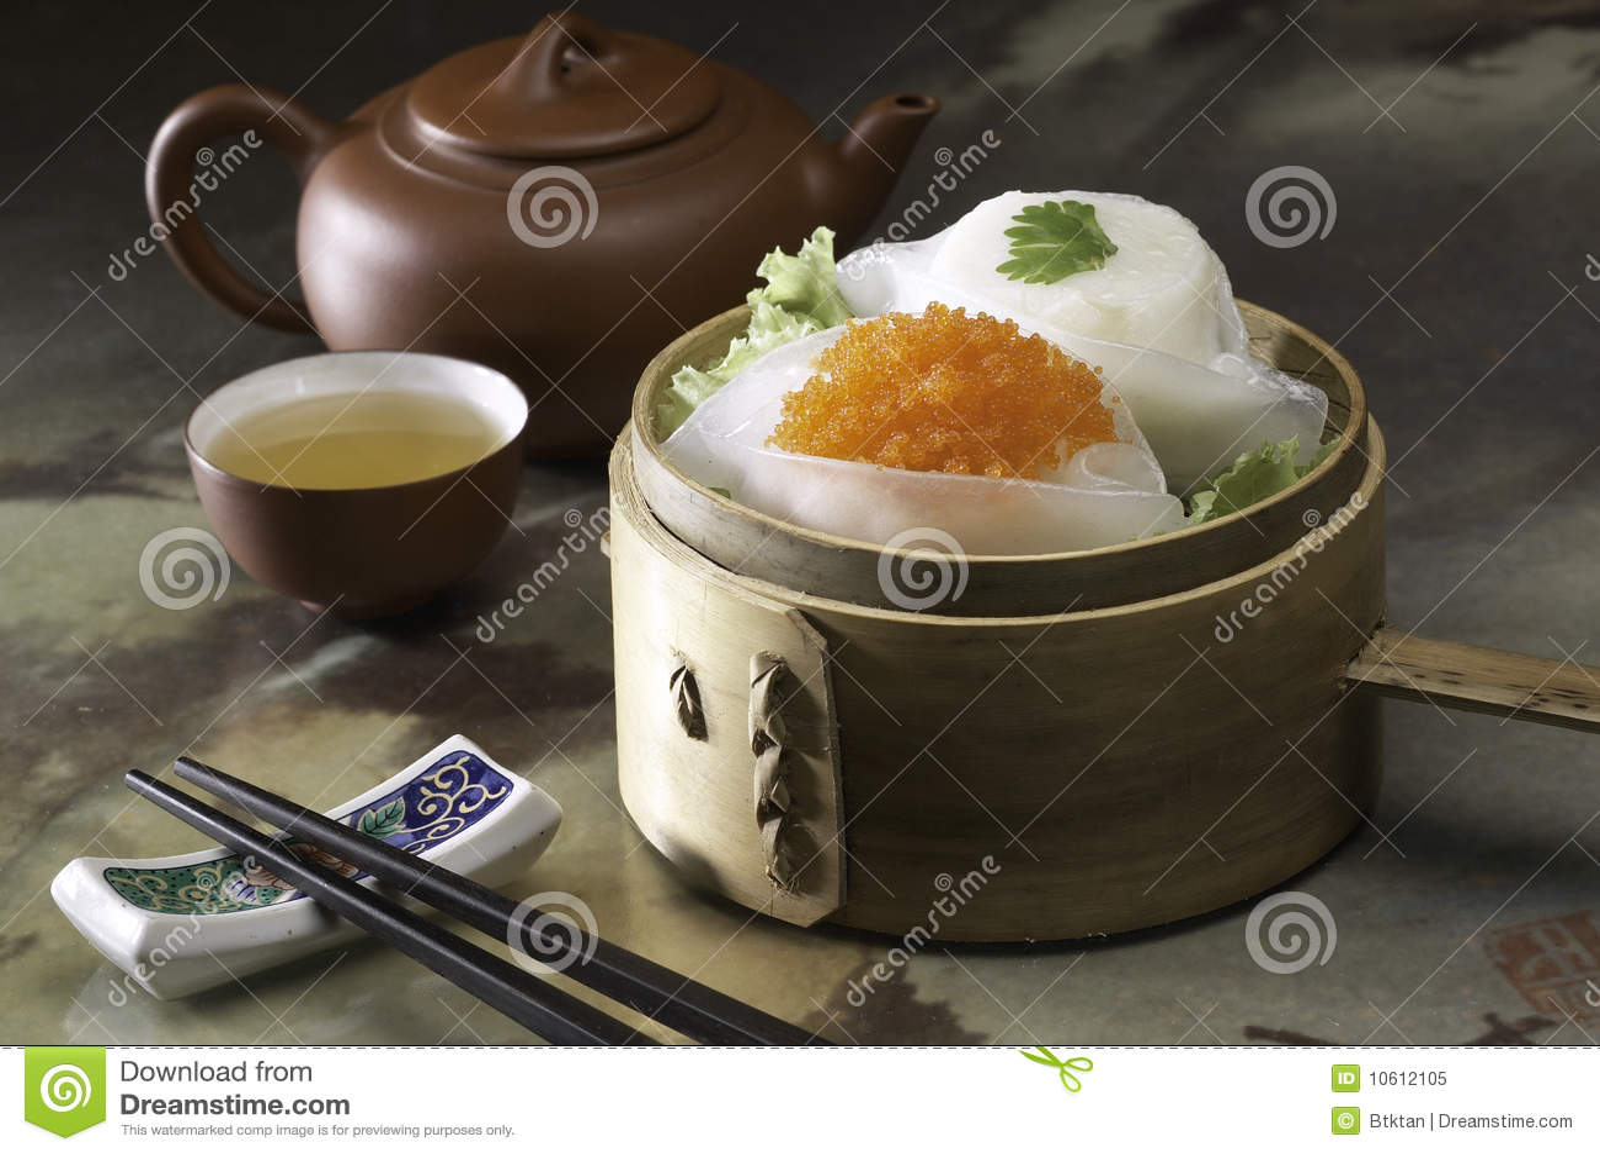 Asian food18